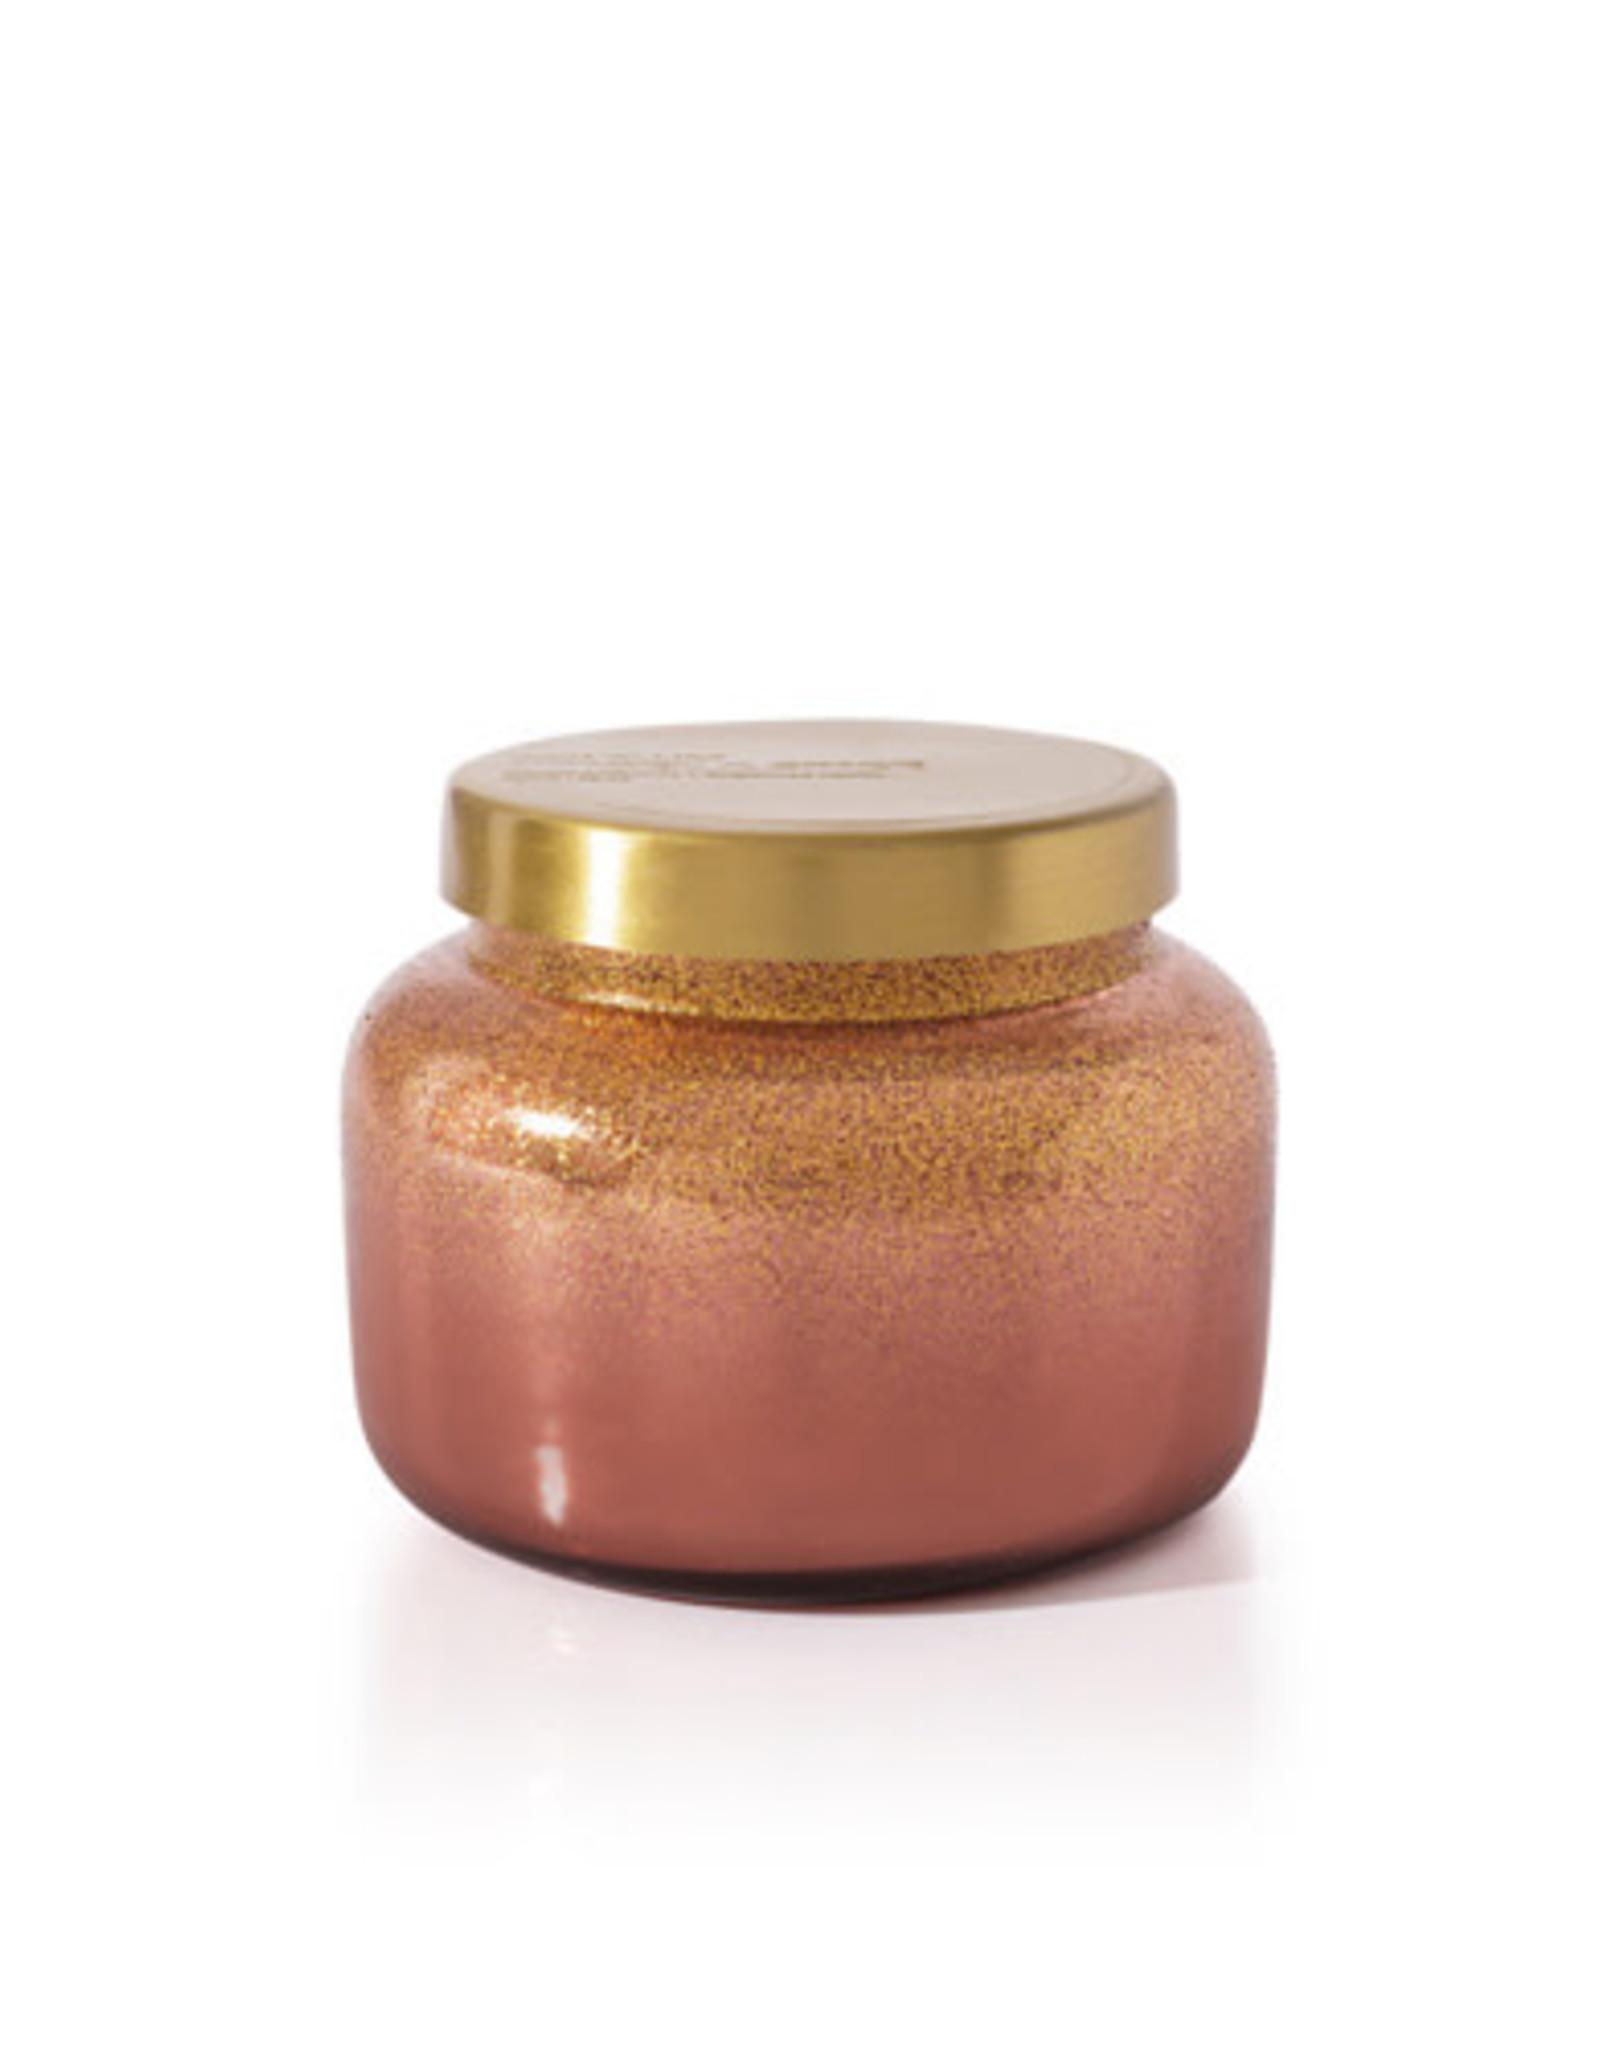 capri BLUE® Tinsel & Spice Glitz Signature Jar